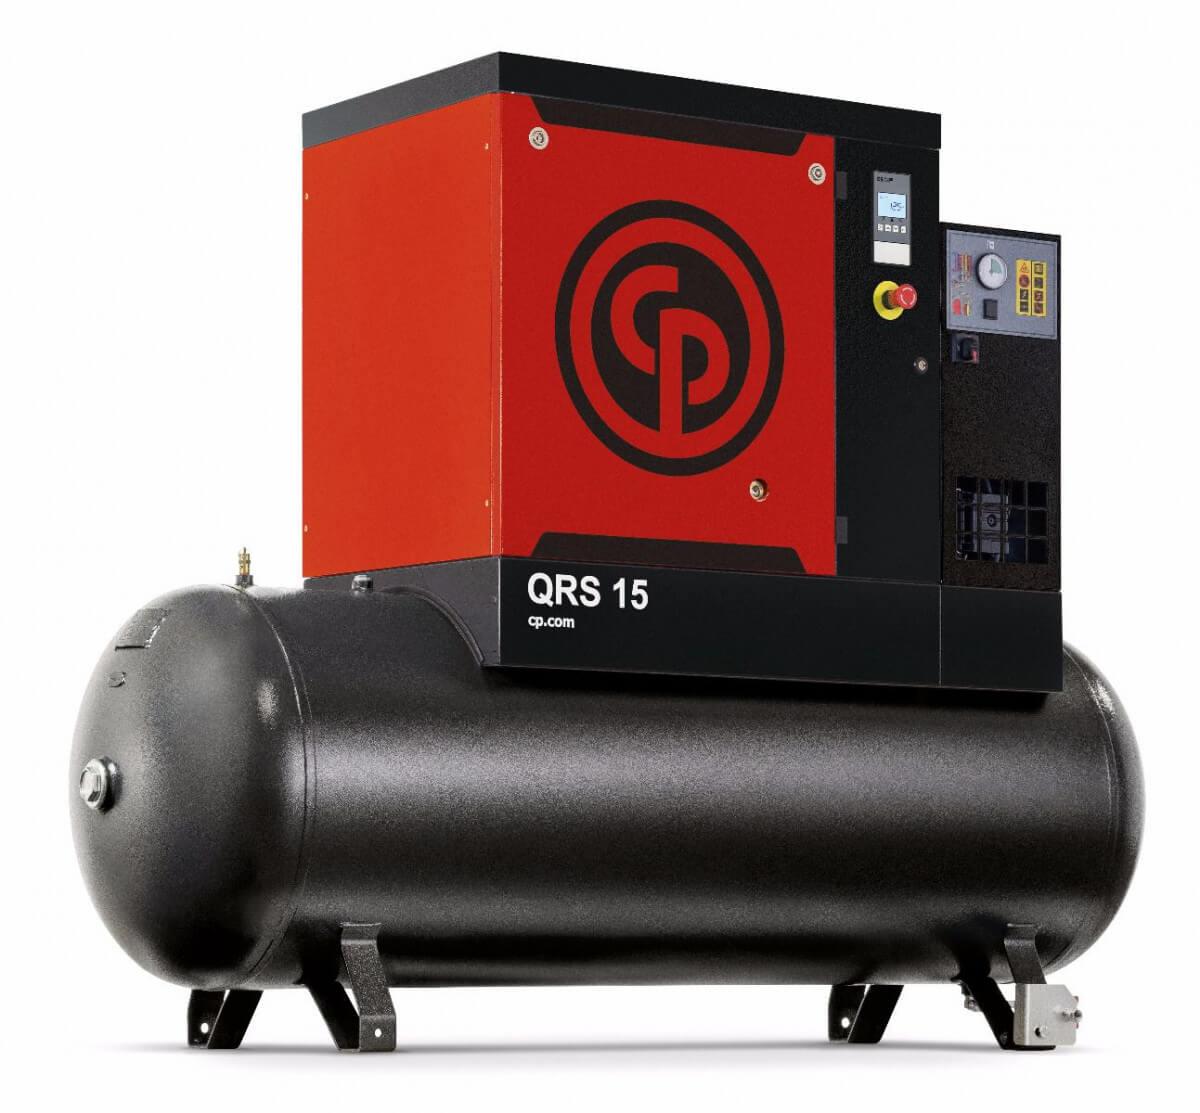 Granite Shop - Choosing an Air Compressor